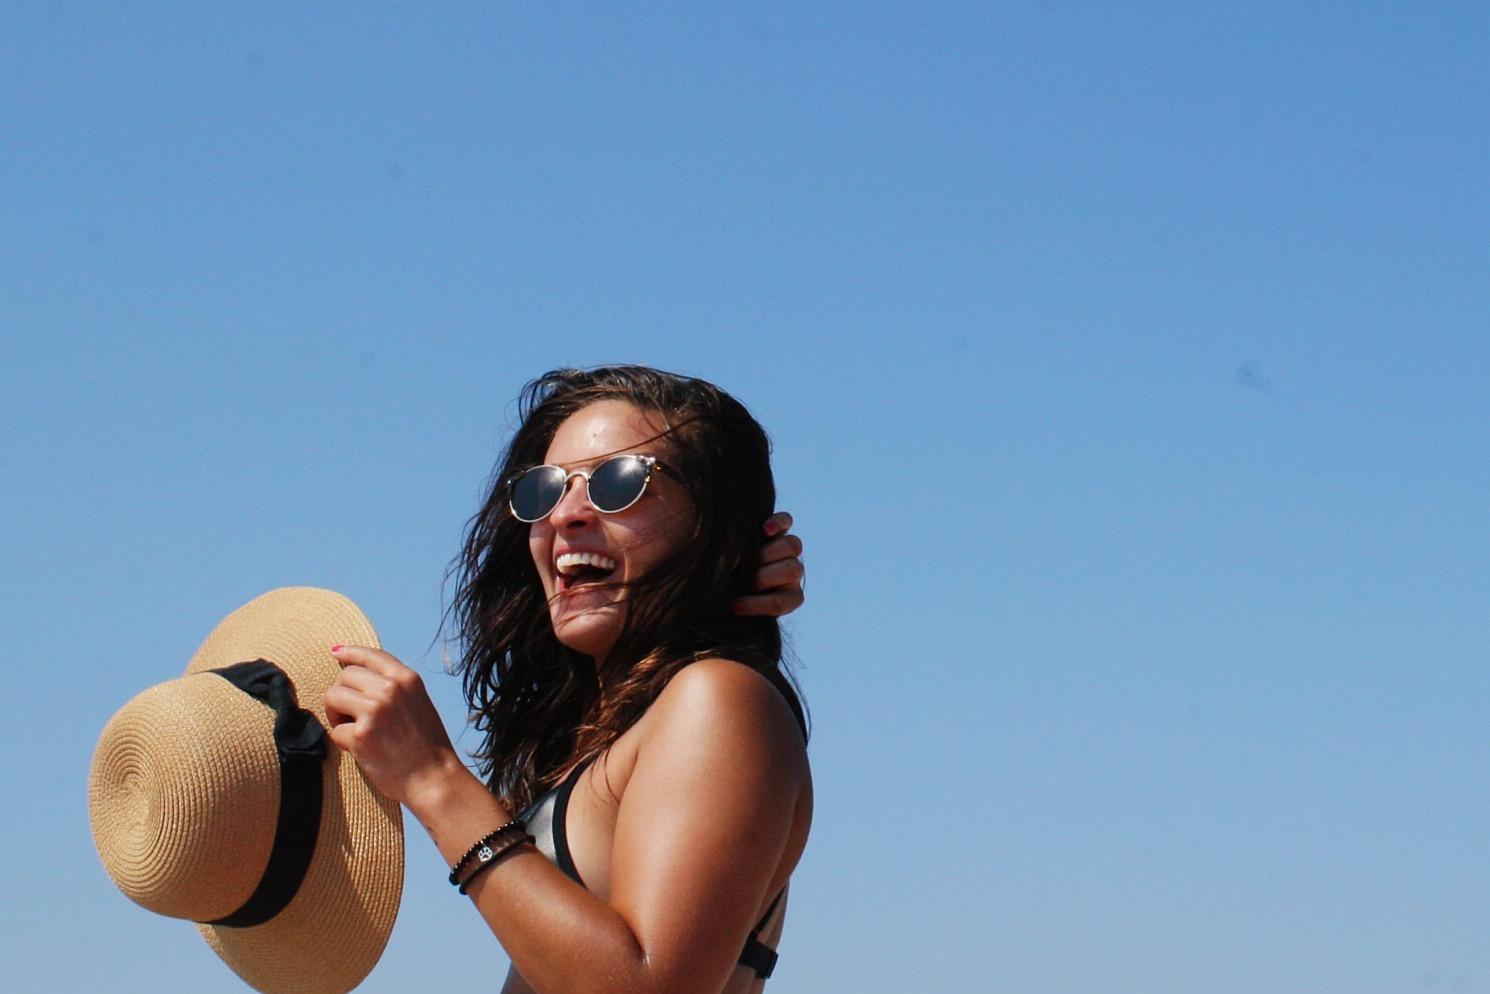 straw hat, blue sky, bikini